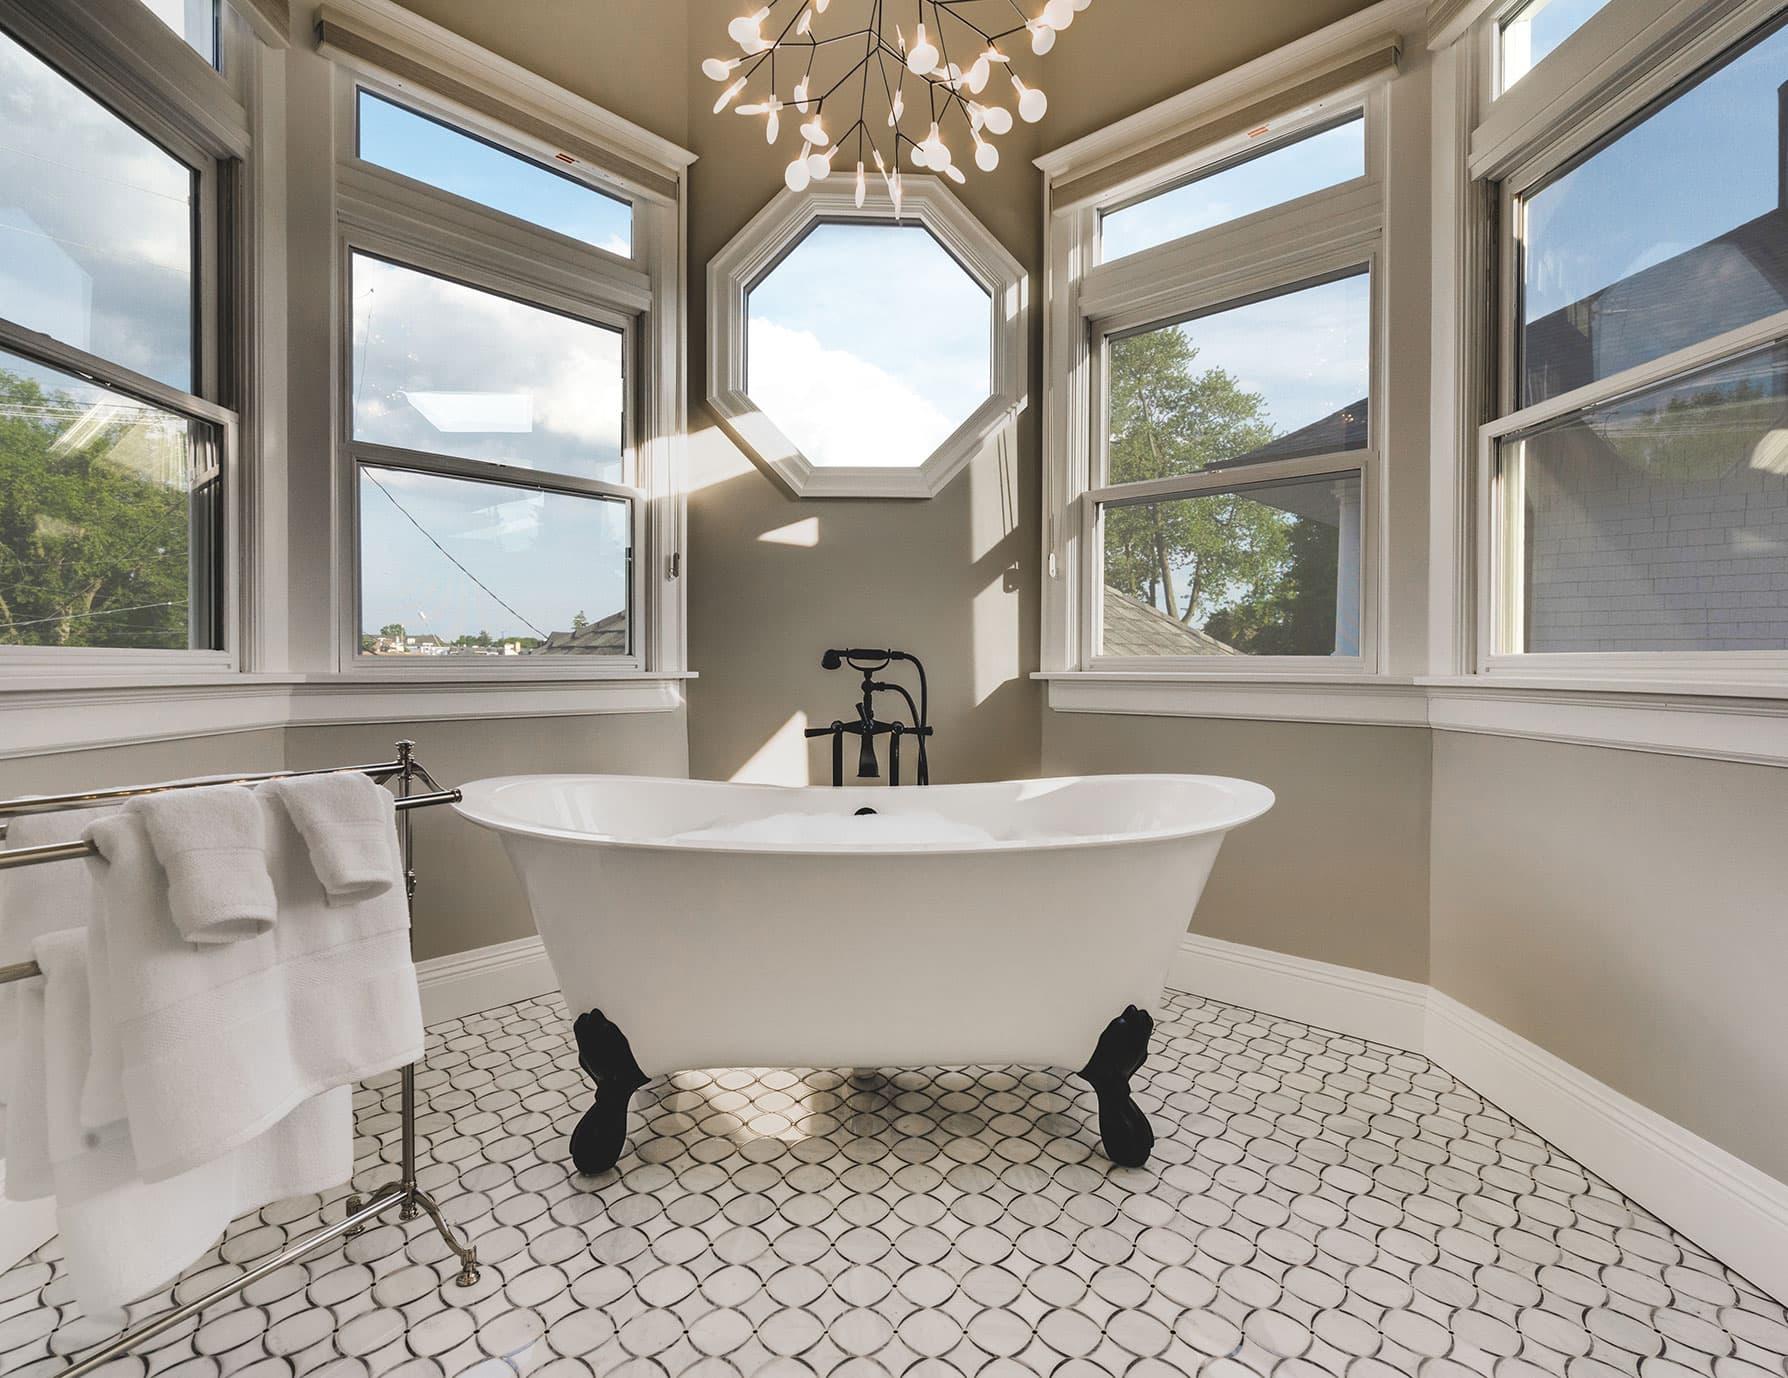 Lark Suite Claw Foot Bathtub